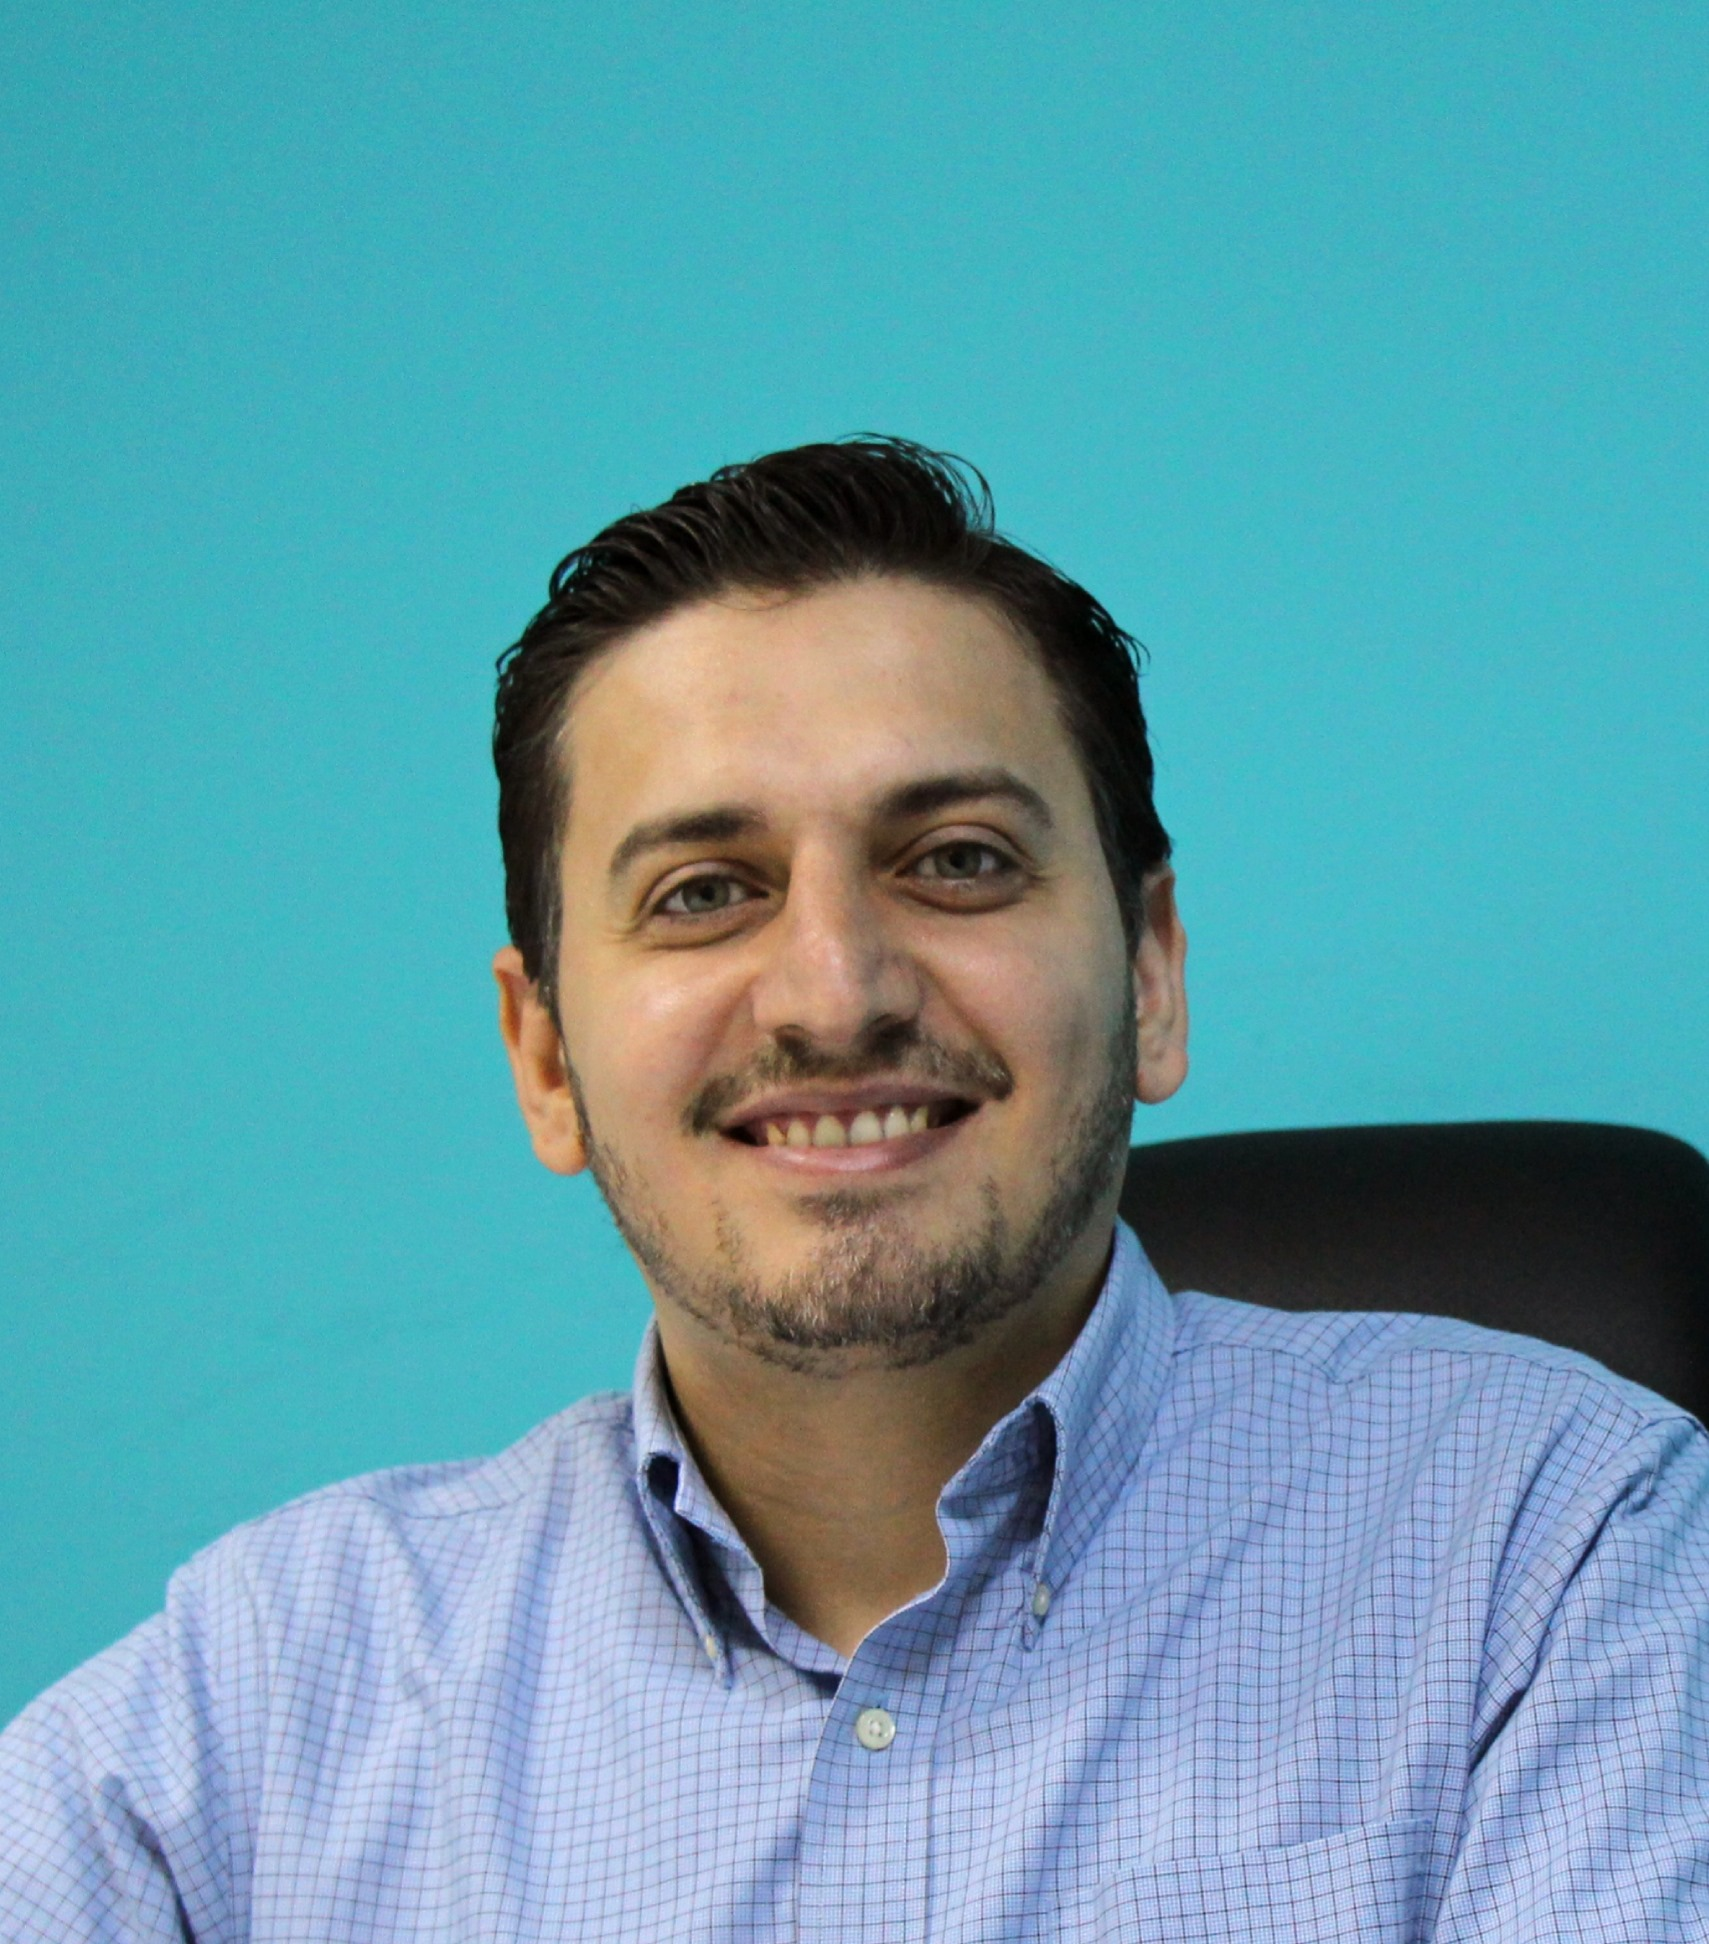 Dr. Hussein AL-NATSHEH